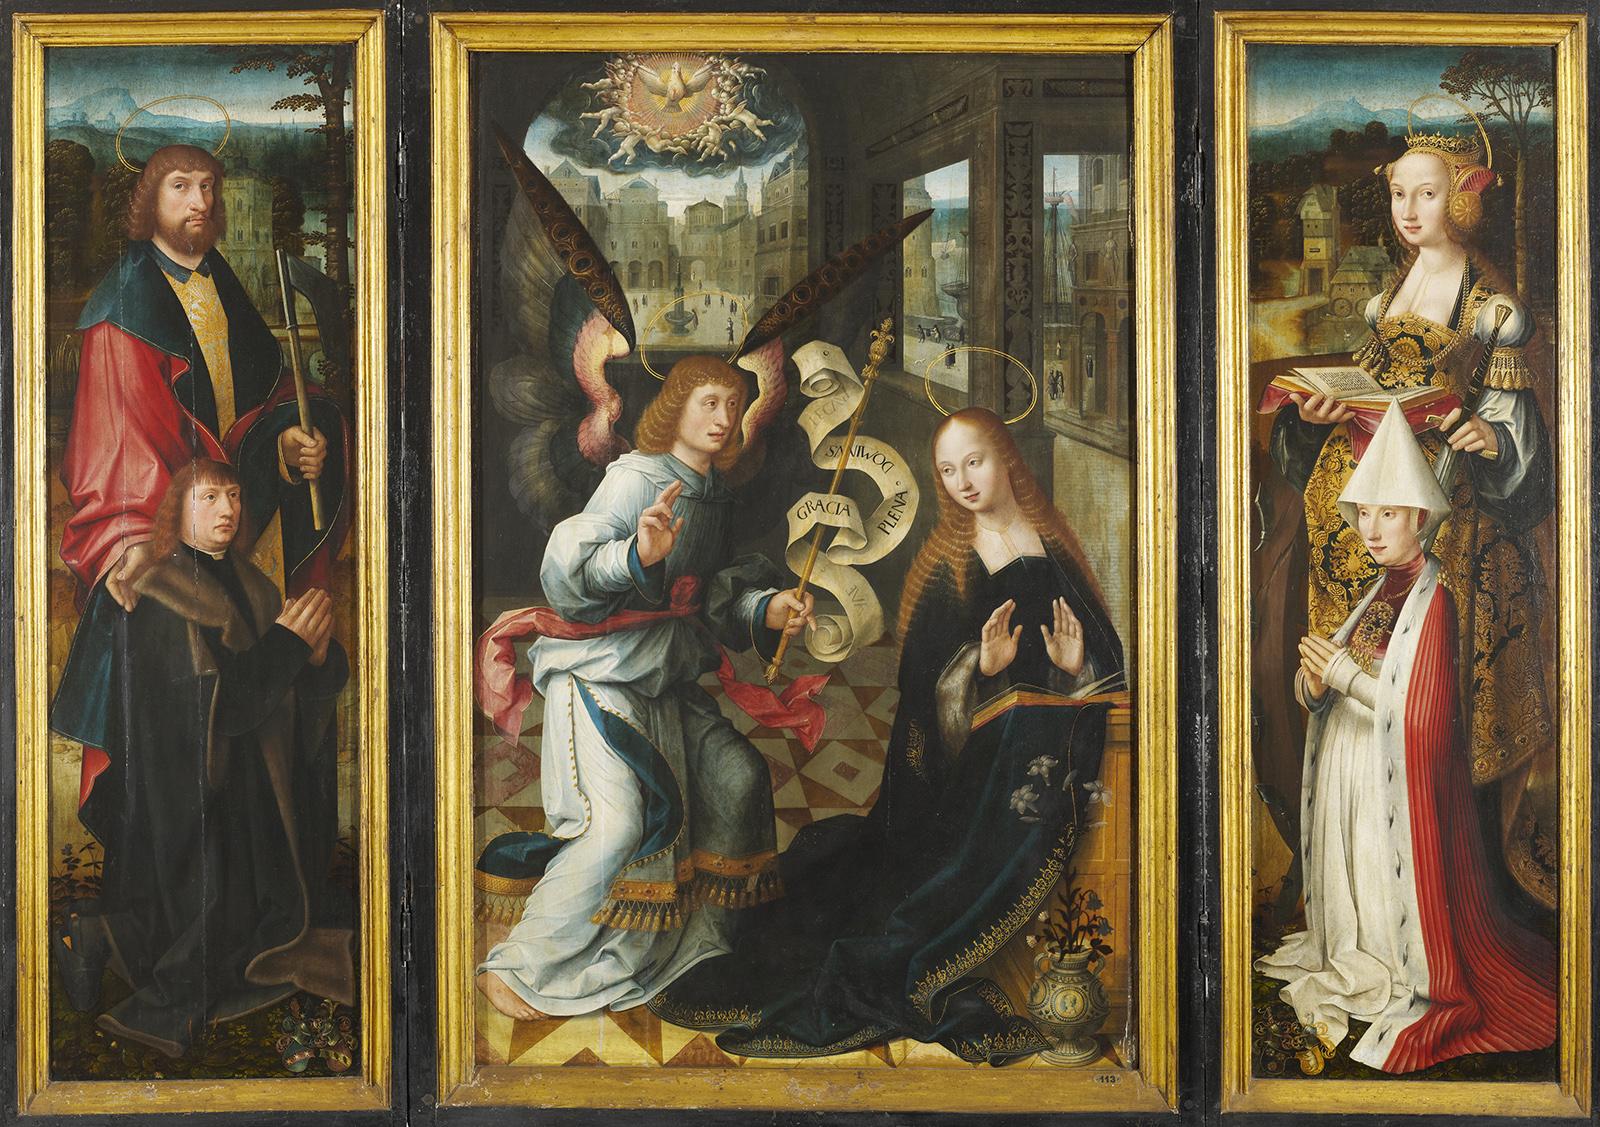 Verkündigungsaltar von Jacob Claesz van Utrecht, 1520/22